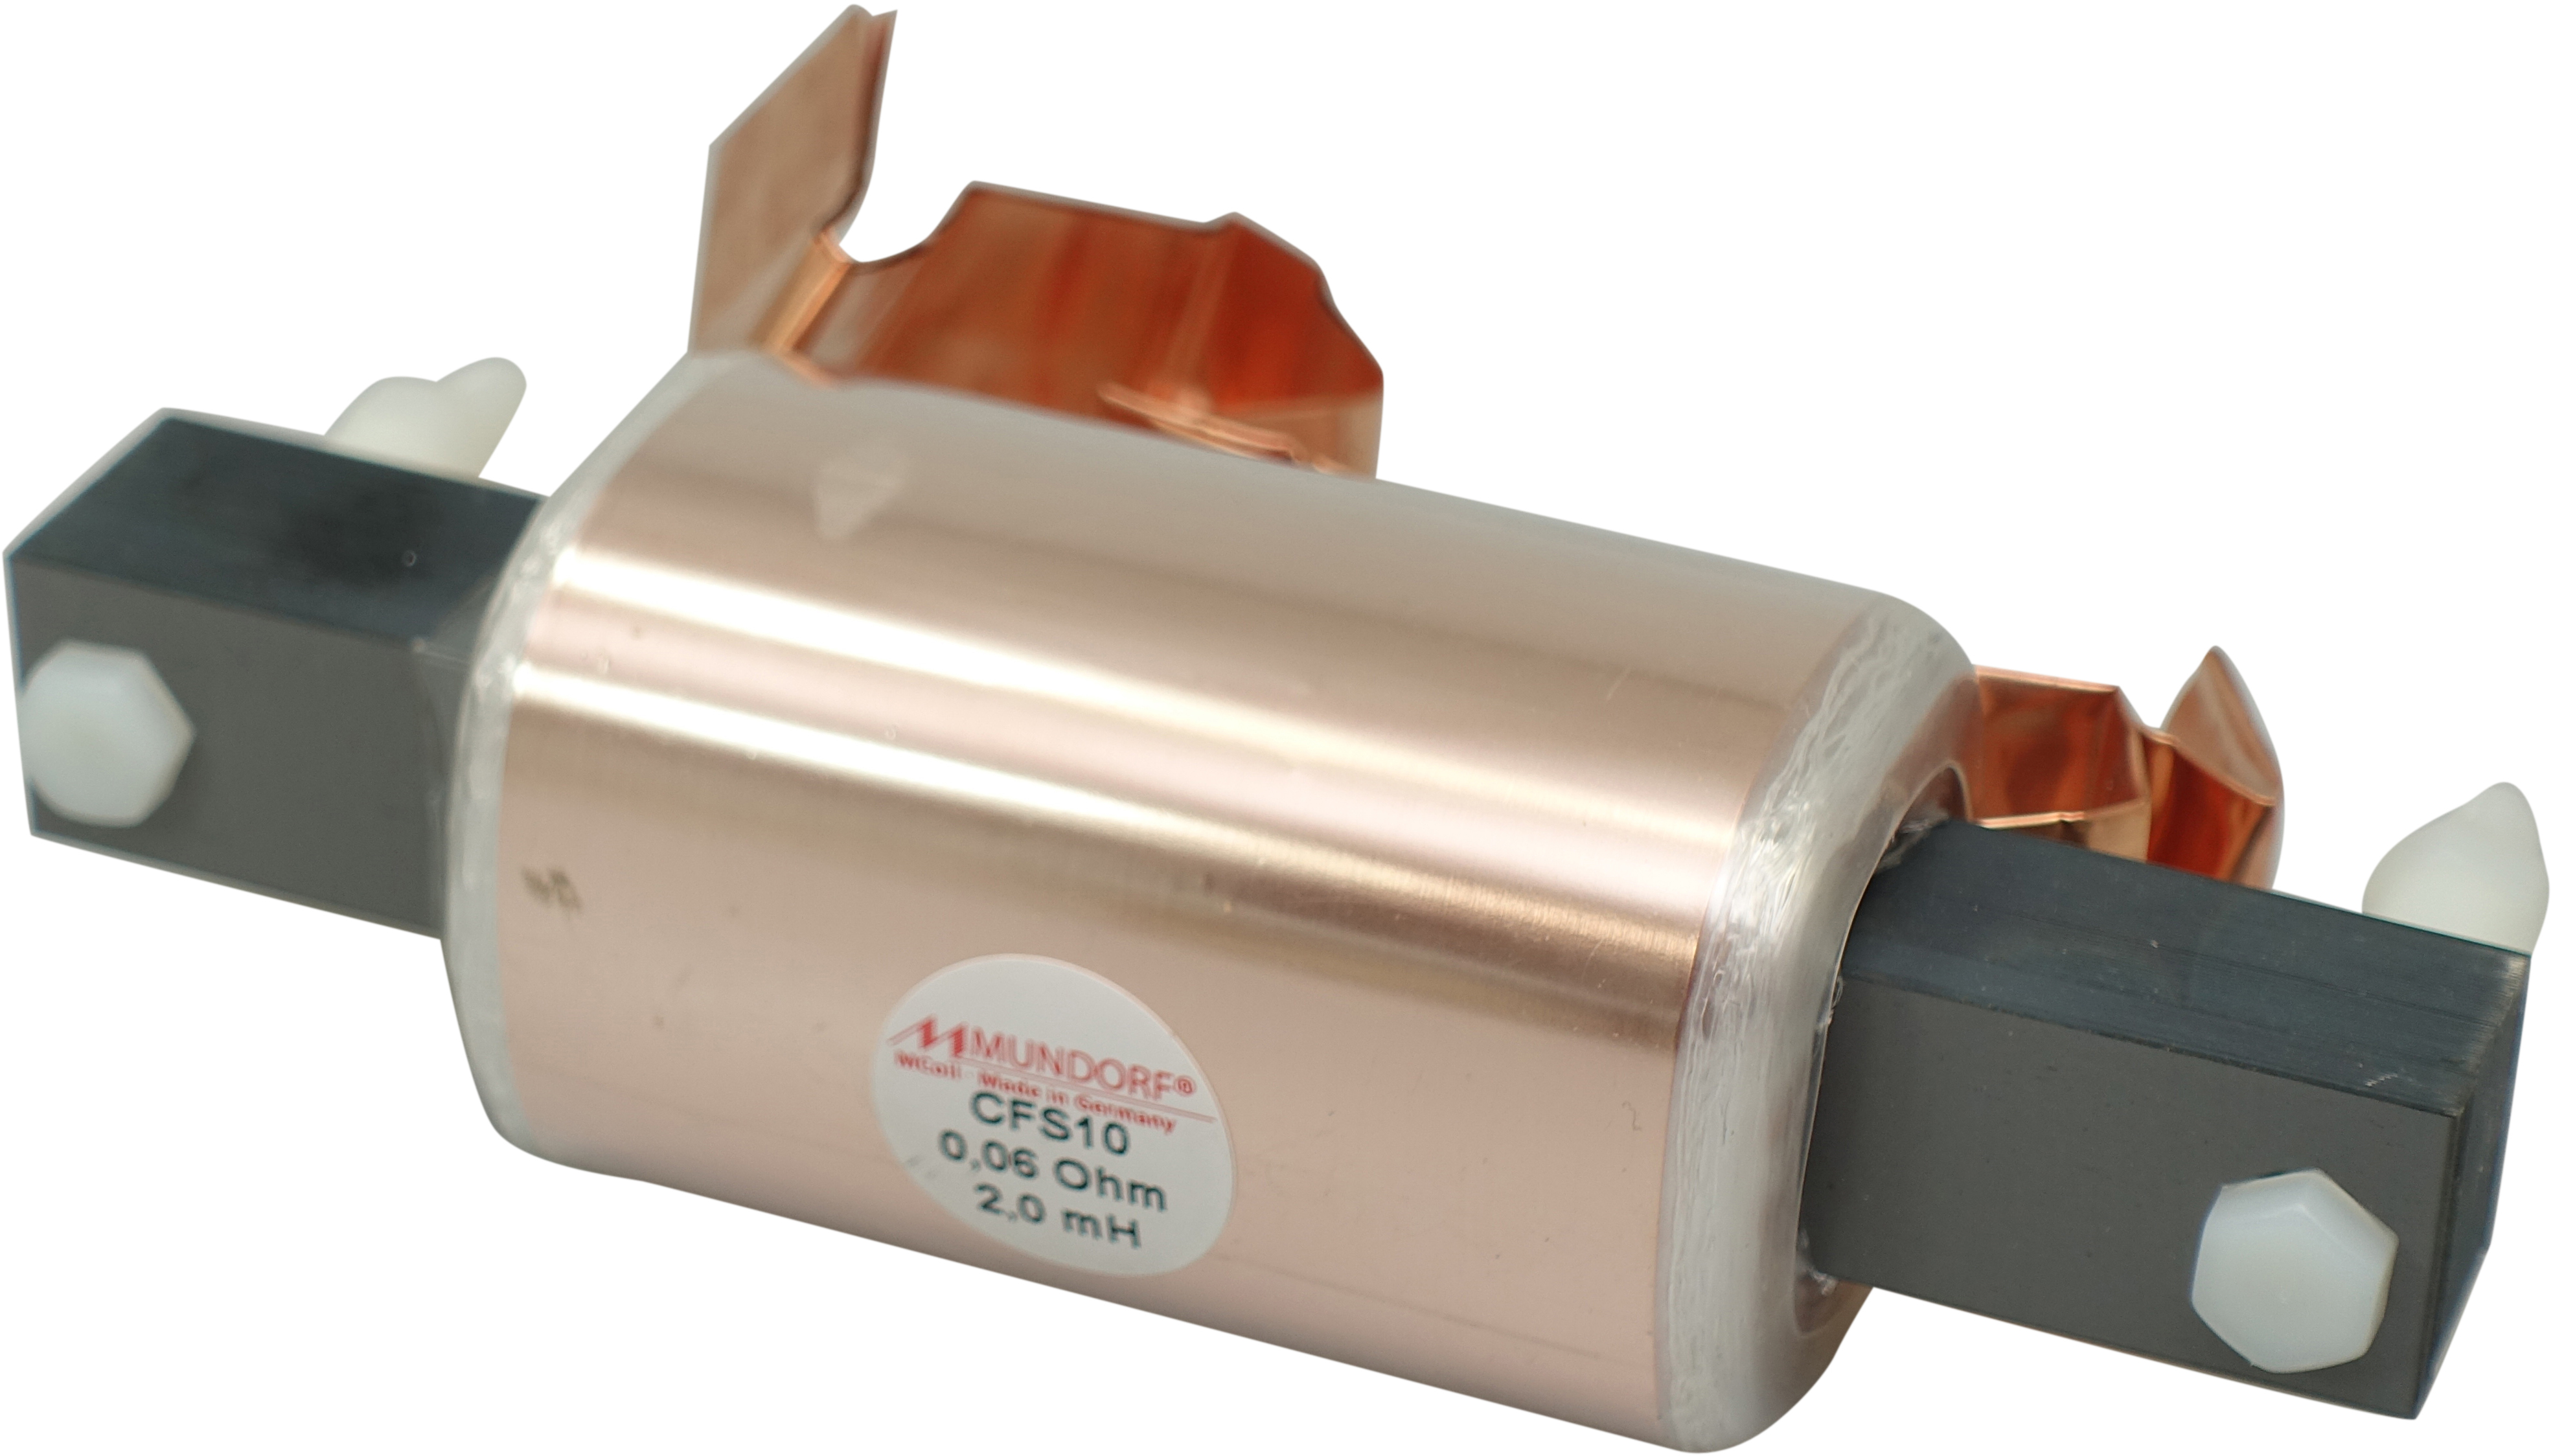 Mundorf MCoil CFS10-2,0mH